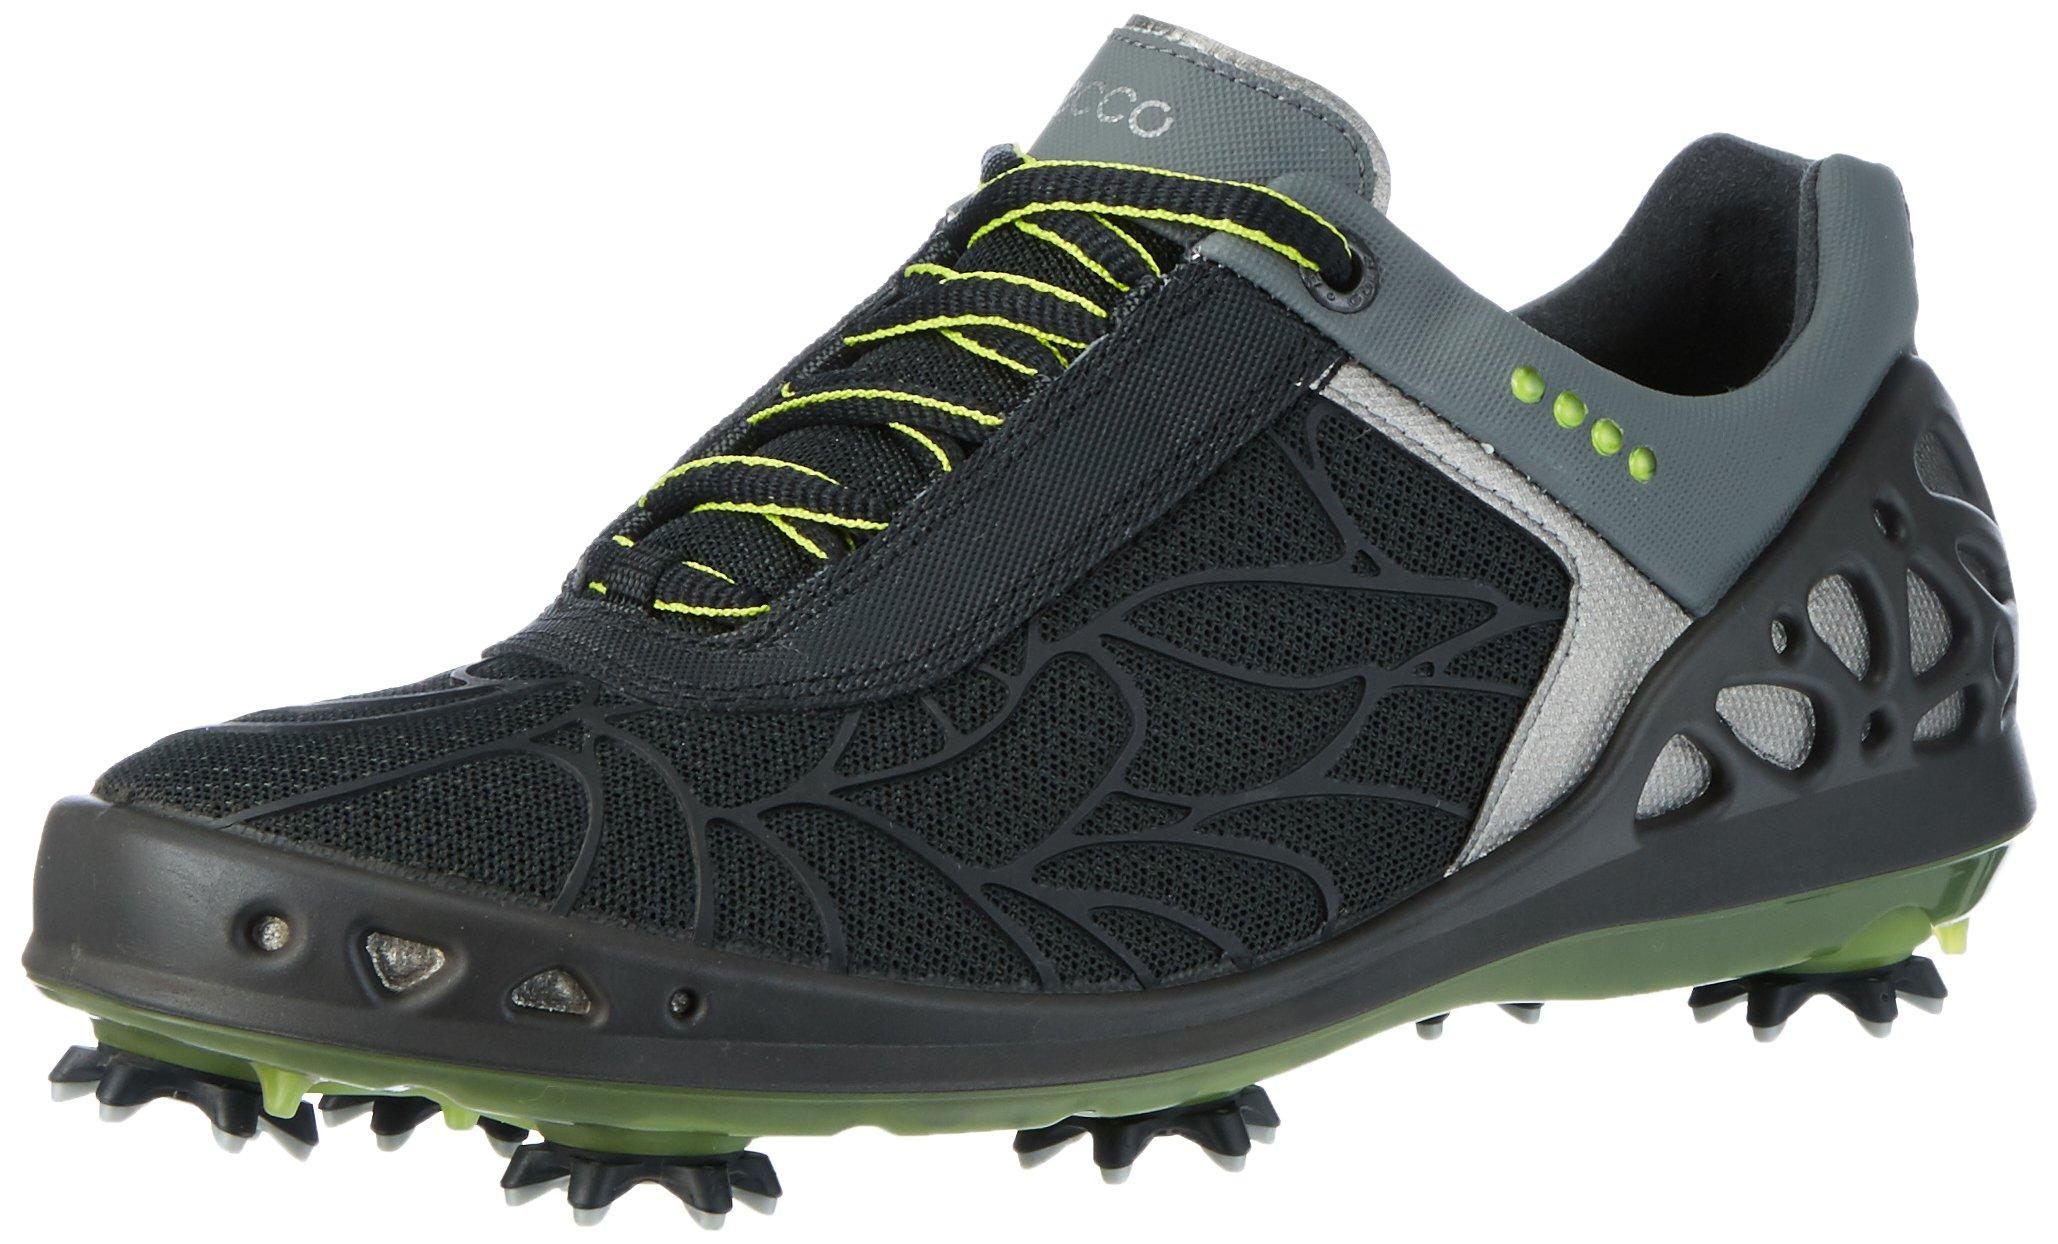 ECCO Women's Cage Evo Golf Shoe, Black, 41 EU/10-10.5 M US